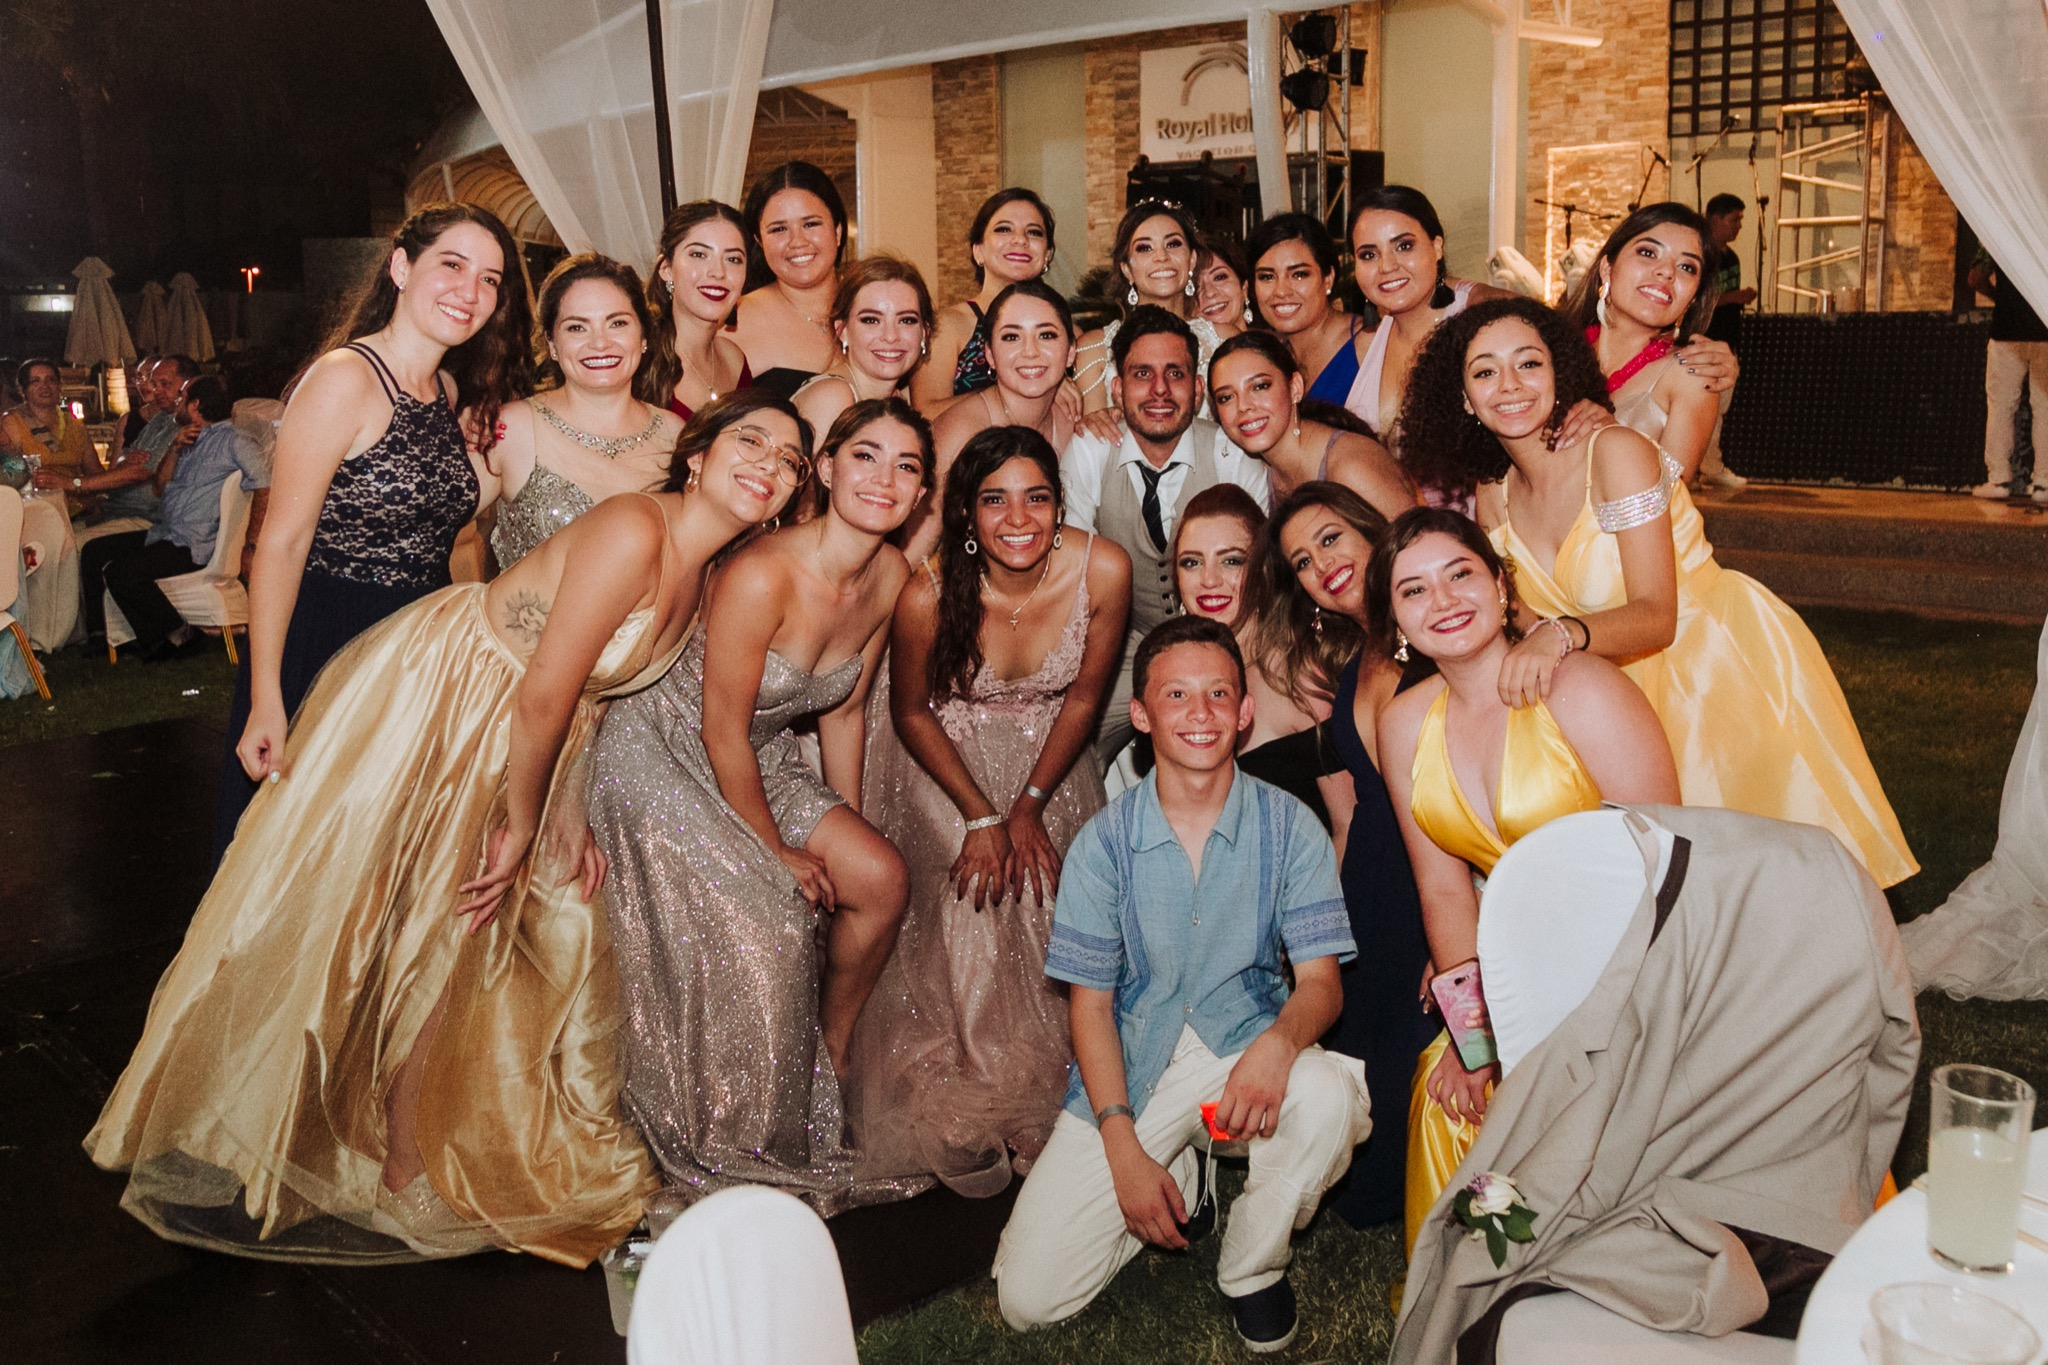 Javier_noriega_fotografo_bodas_profesional_zacatecas_mexico_mazatlan_sinaloa_photographer_weddings90